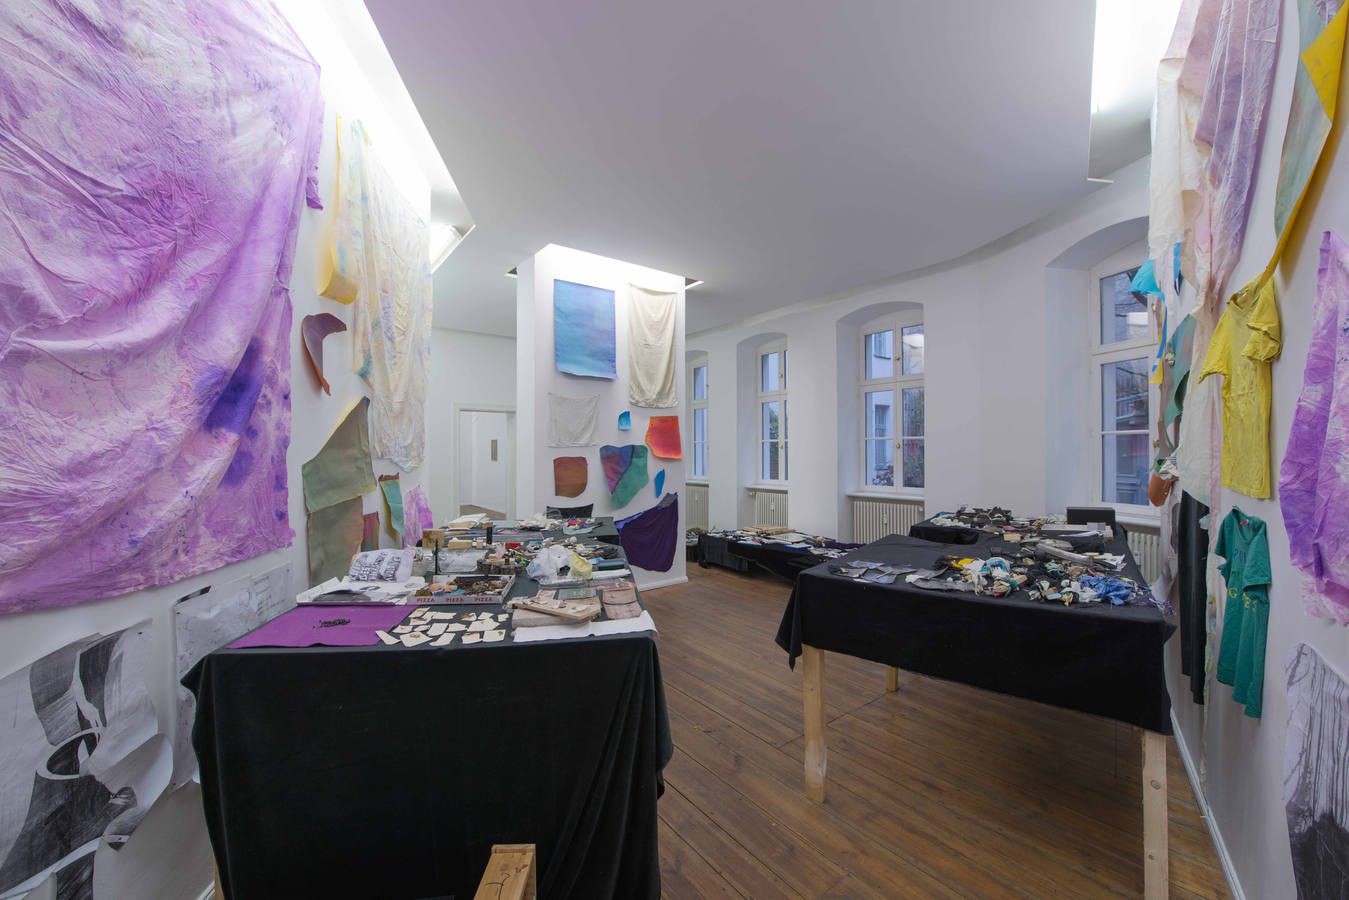 TGood RETO PULFER artdoc Grimmuseum 05 12 2014 _0301